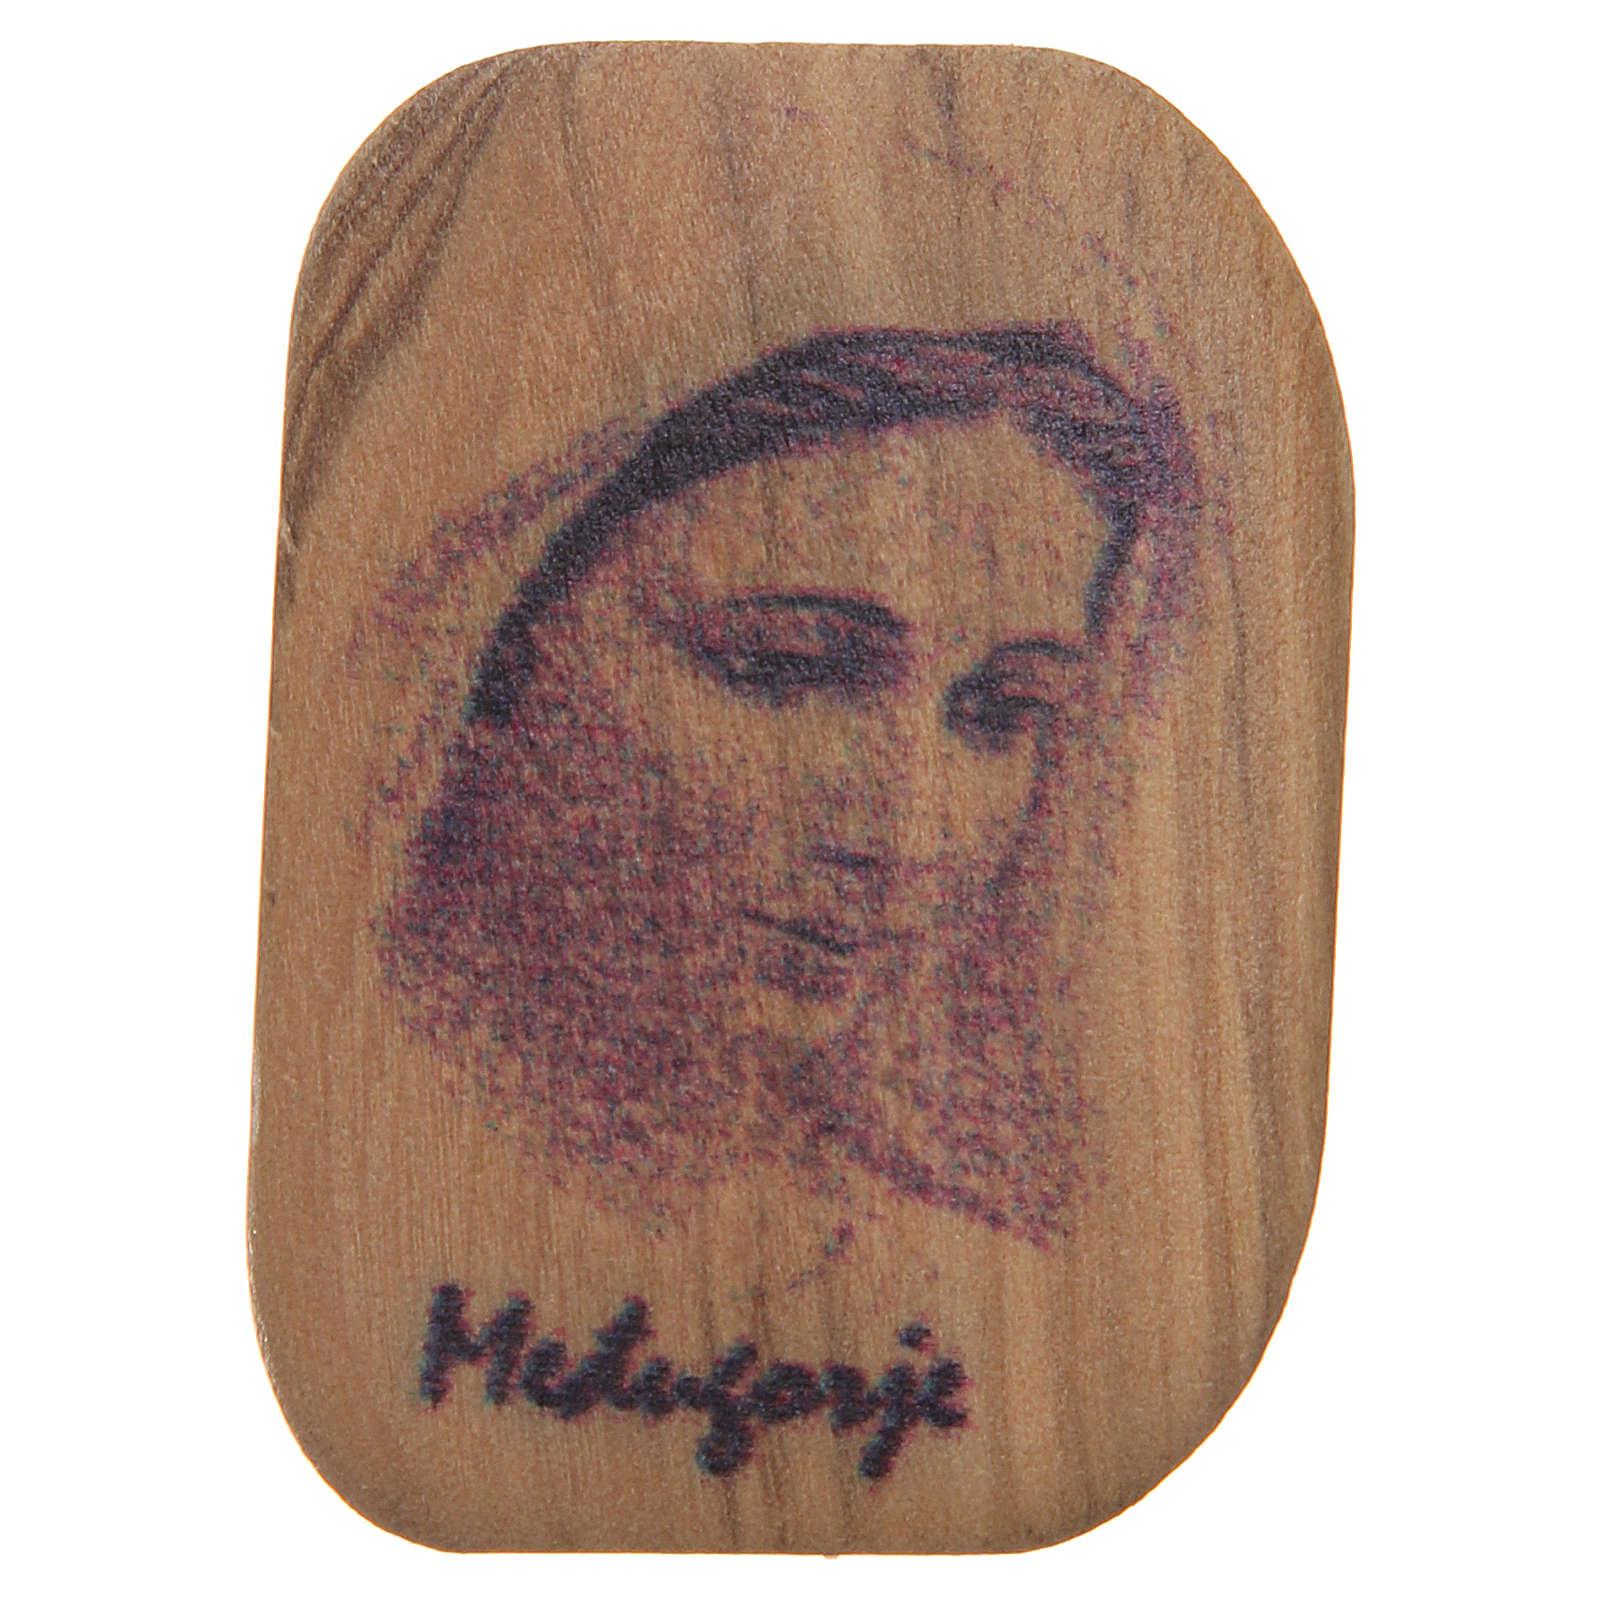 Calamita legno ulivo Madonna Medjugorje 4,2x3 cm 4